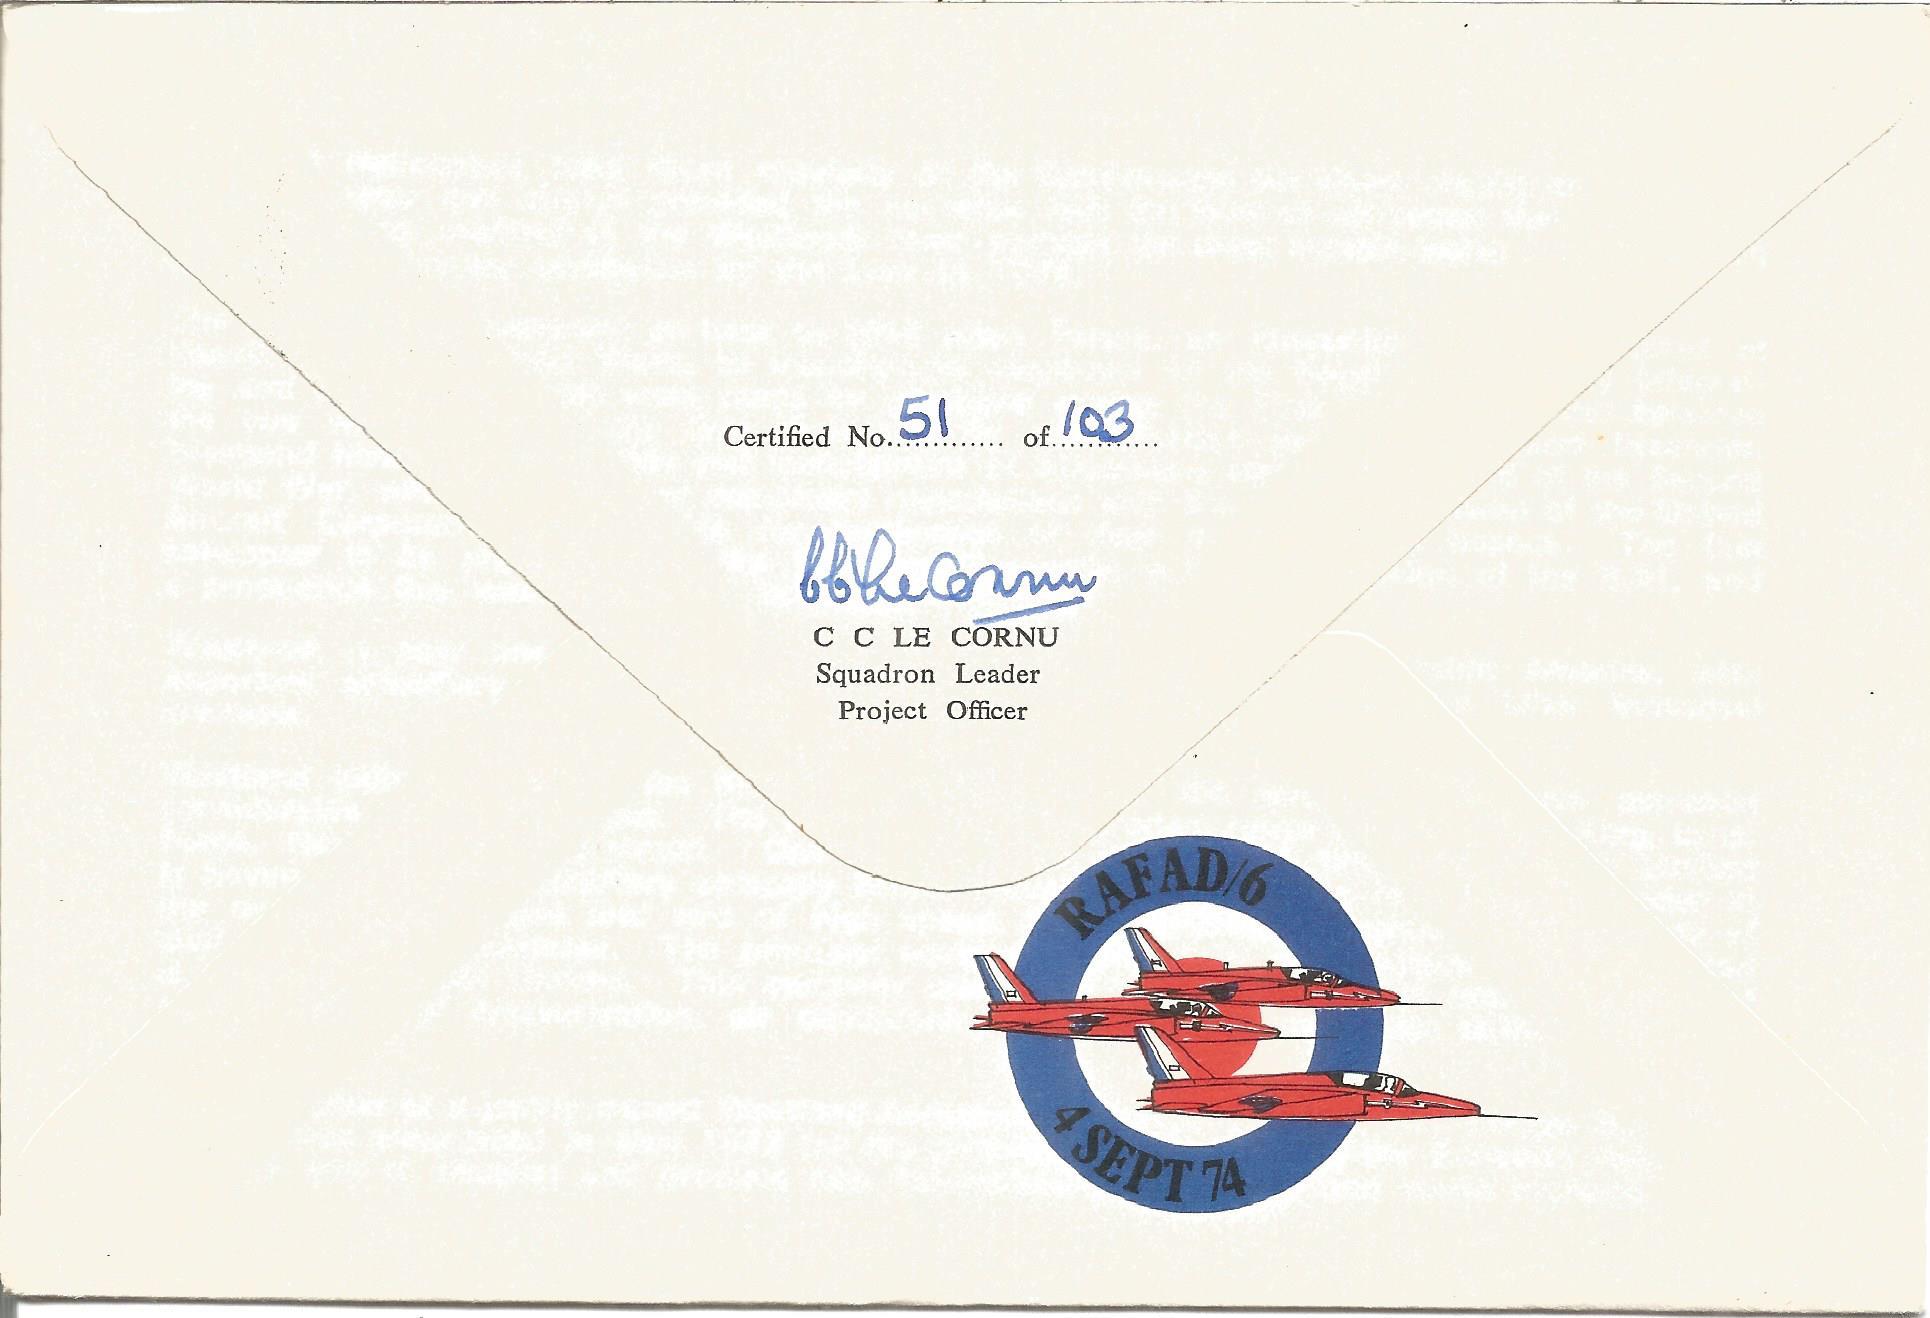 R.P. Probert CB with Sqn Ldr C.C. Le Cornu on reverse signed Farnborough International 1974 Westland - Image 2 of 2